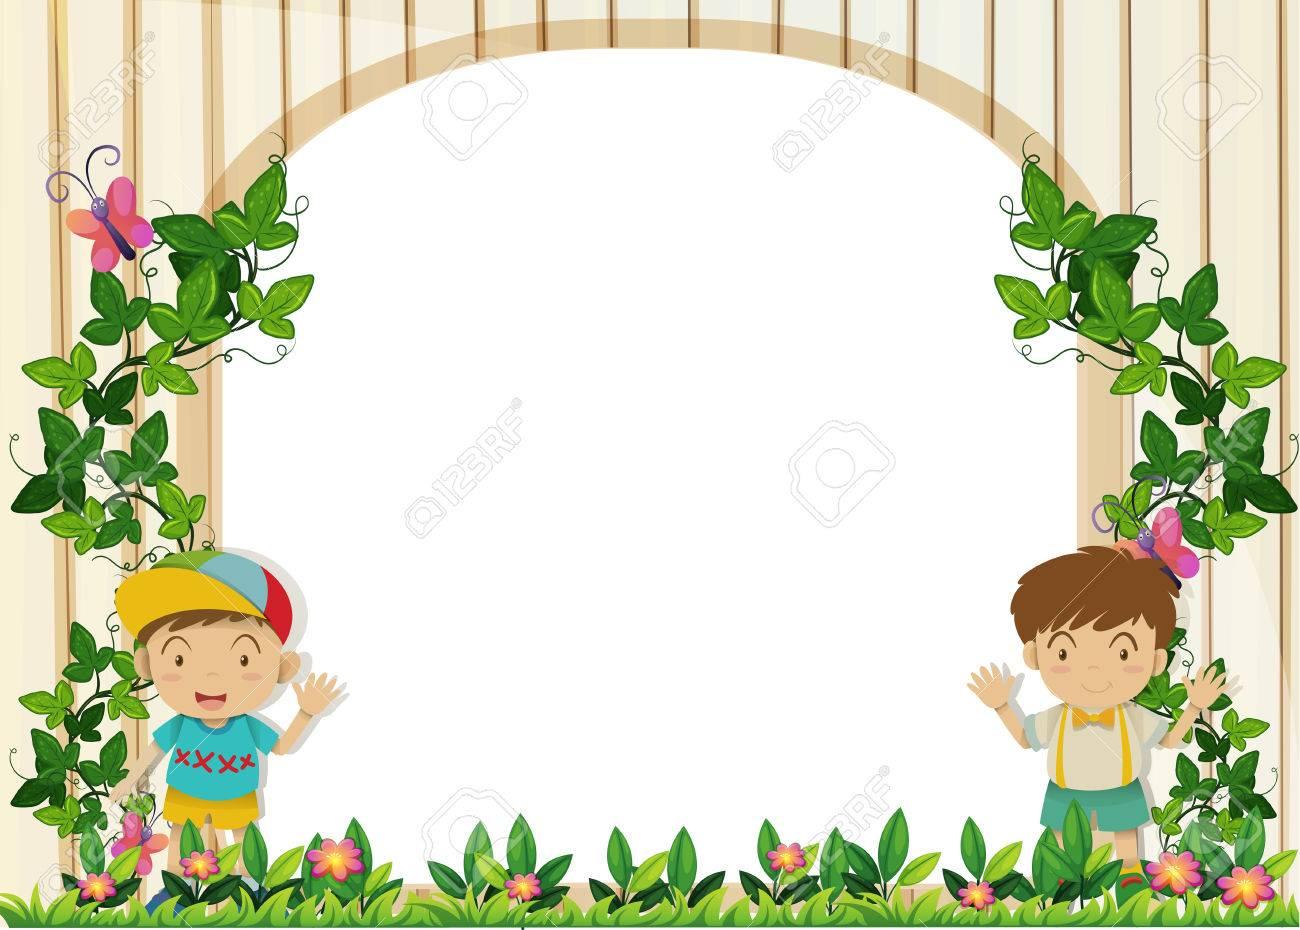 Border design with boys in the garden illustration.